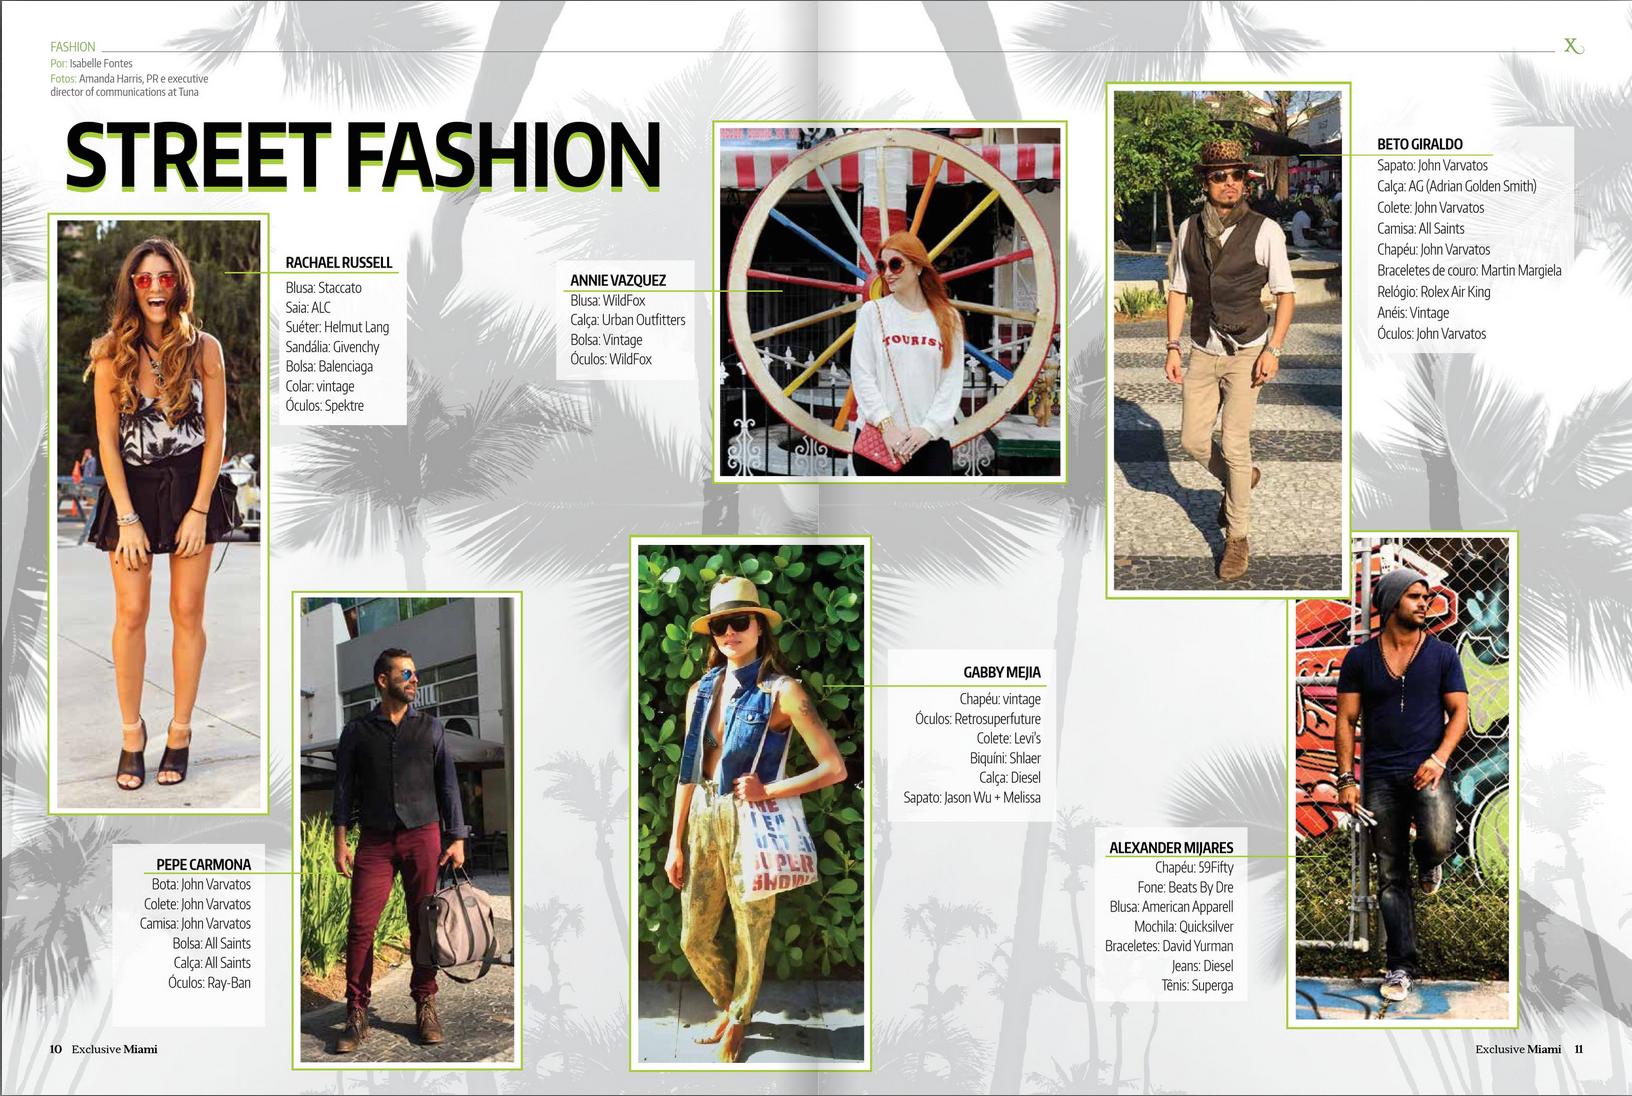 IsabelleFontes-Revista_Exclusive_Miami-JanMar16-StreetFashion.png